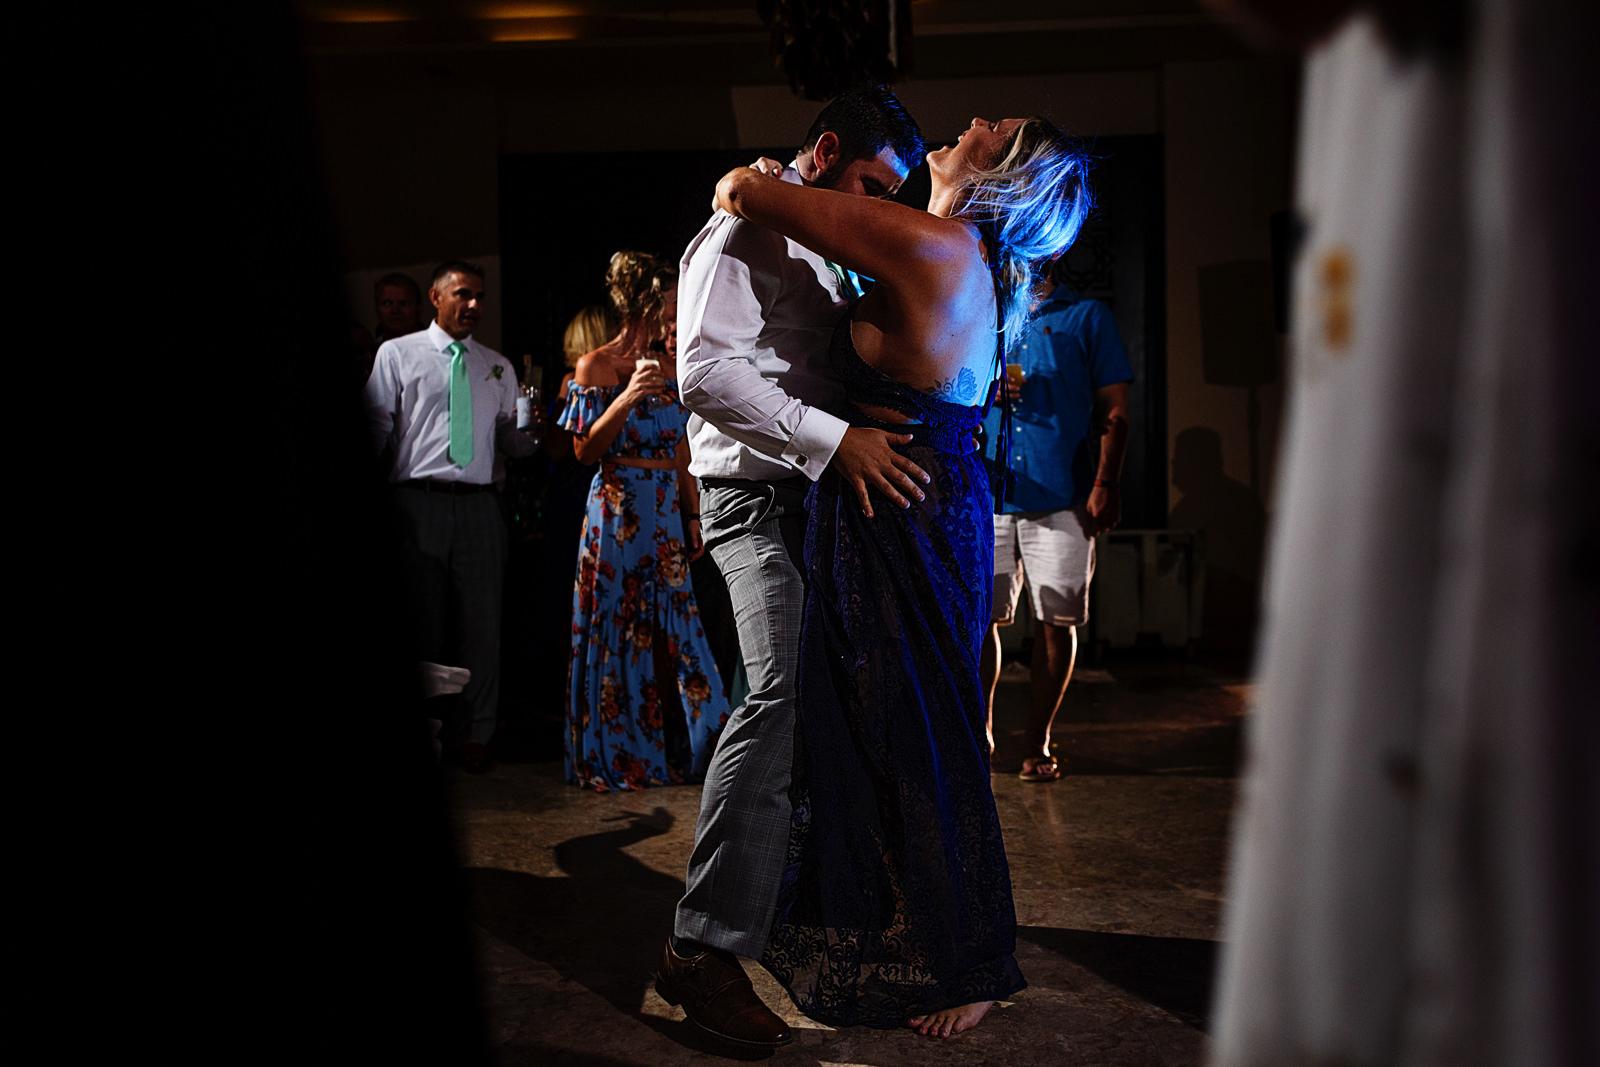 Wedding guests dancing and having fun